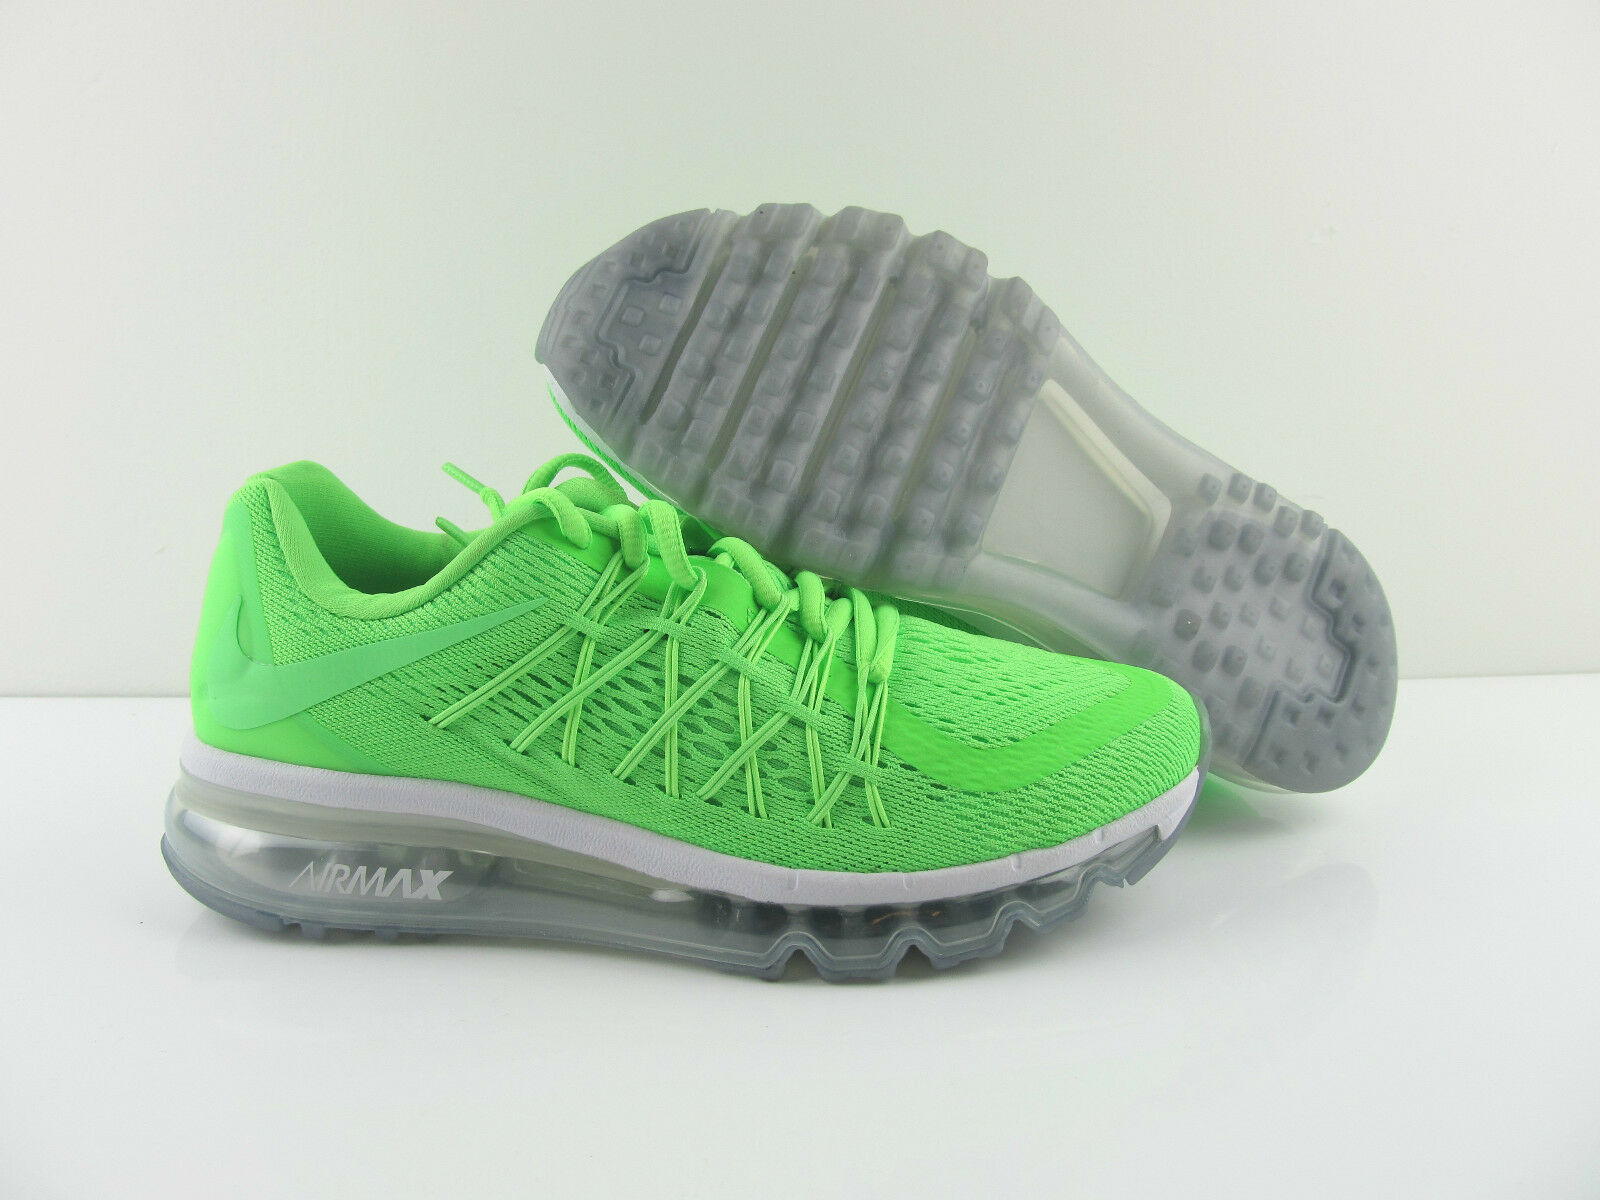 info for 2f32b 59772 ... free shipping nike max air max nike 2018 green voltage corriendo cortos  zapatos new e2e8a2 d4533